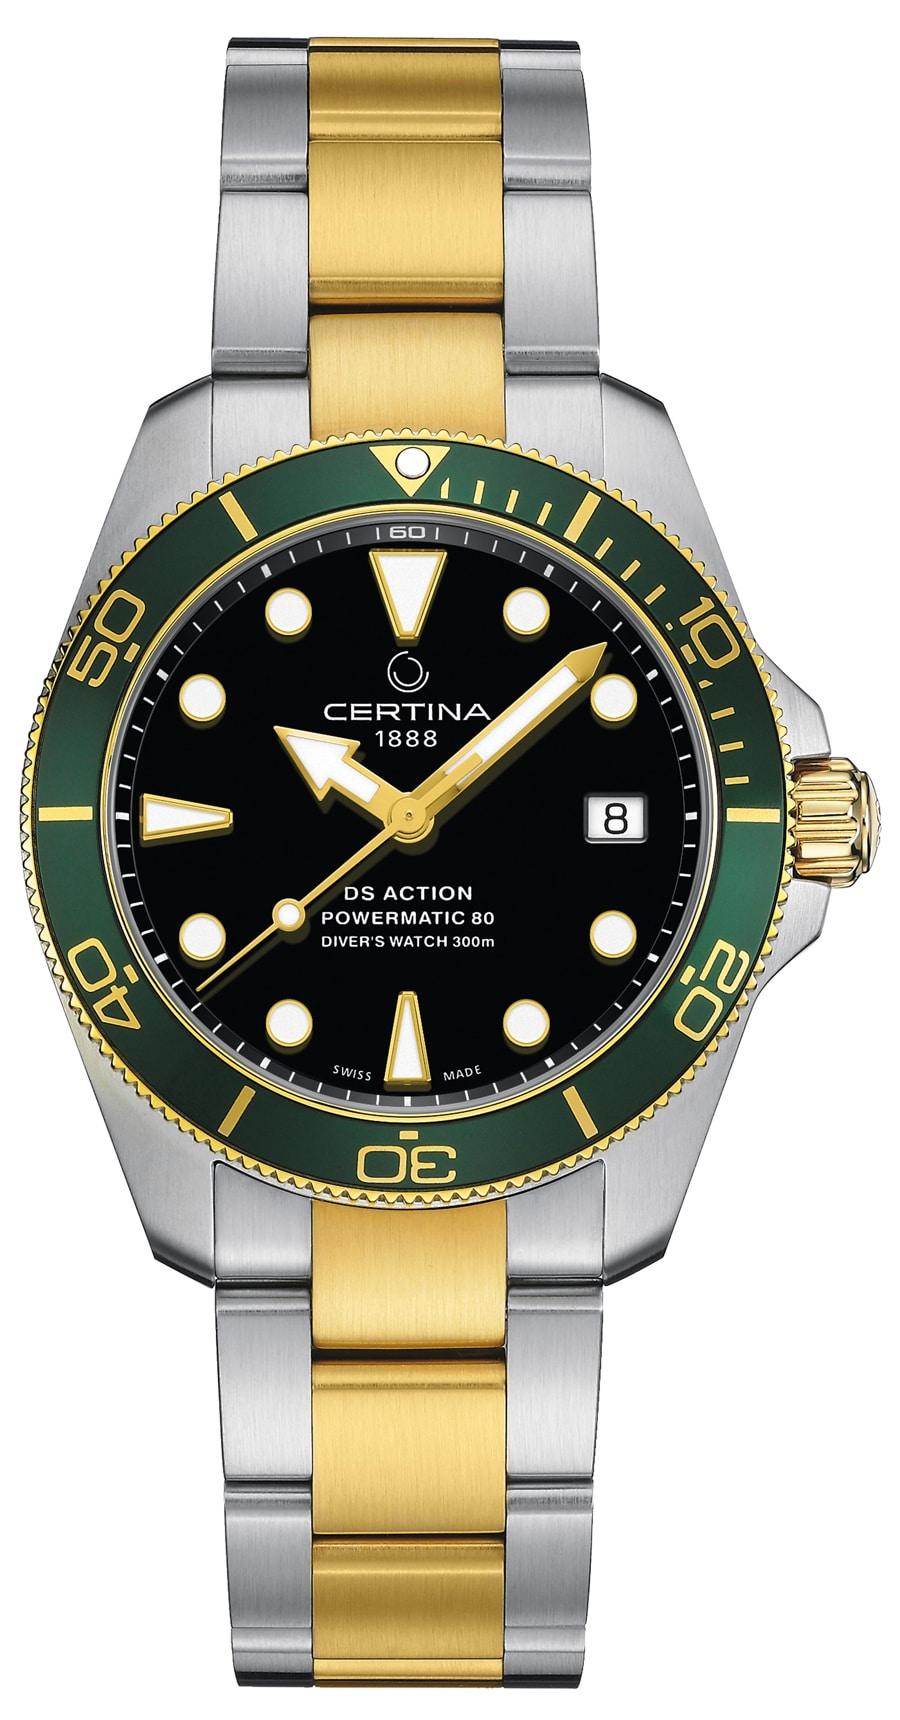 Certina: DS Action Diver schwarzes Zifferblatt grüne Lünette Bicolor